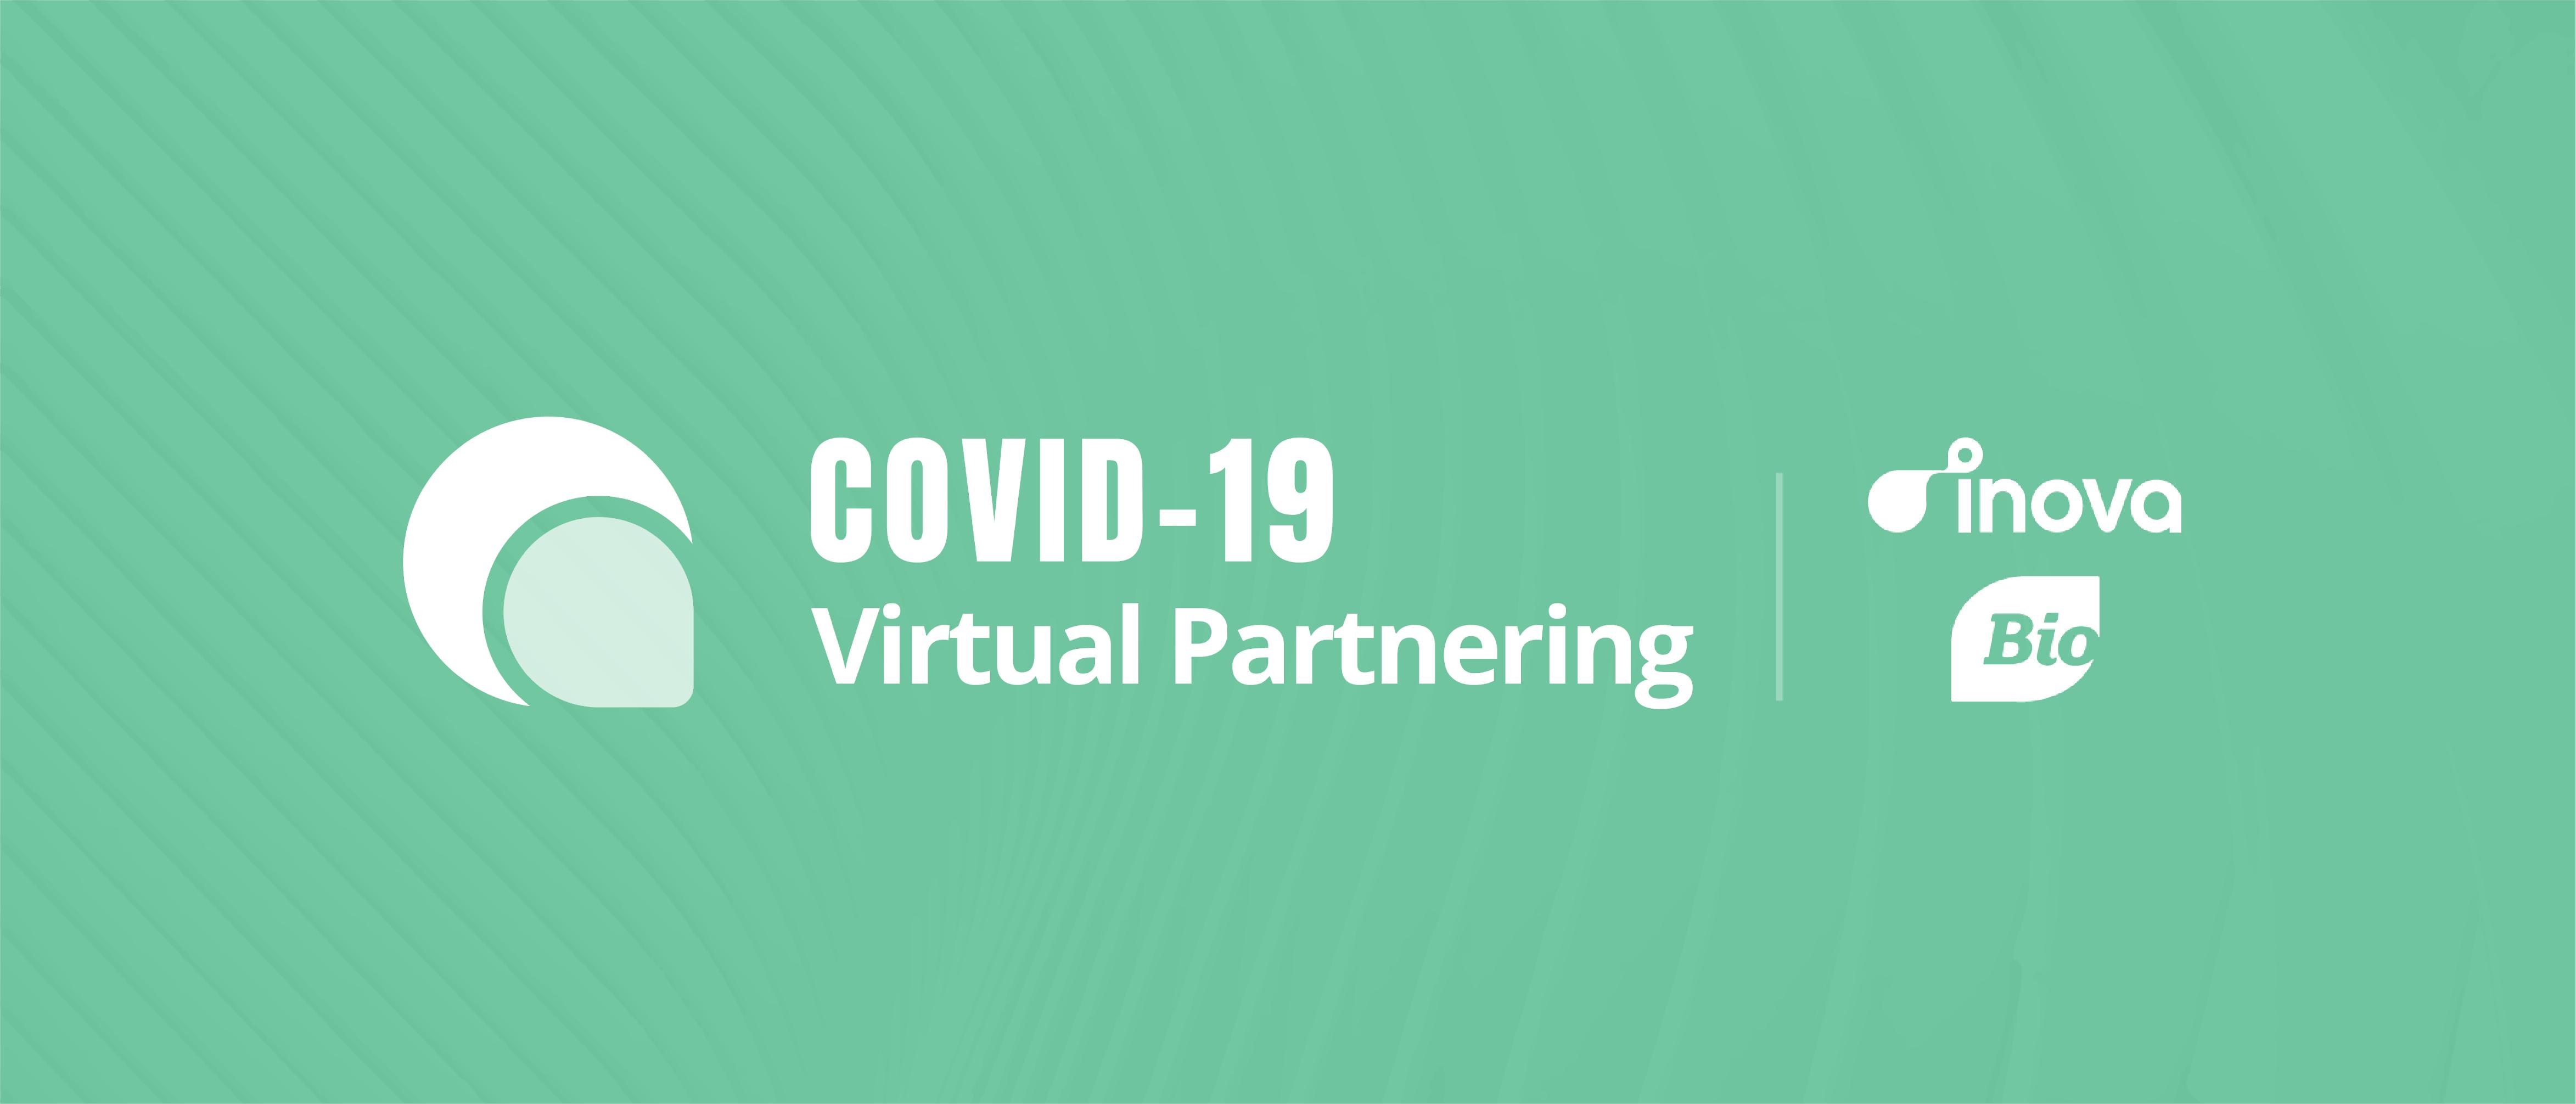 COVID-19 Virtual Partnering